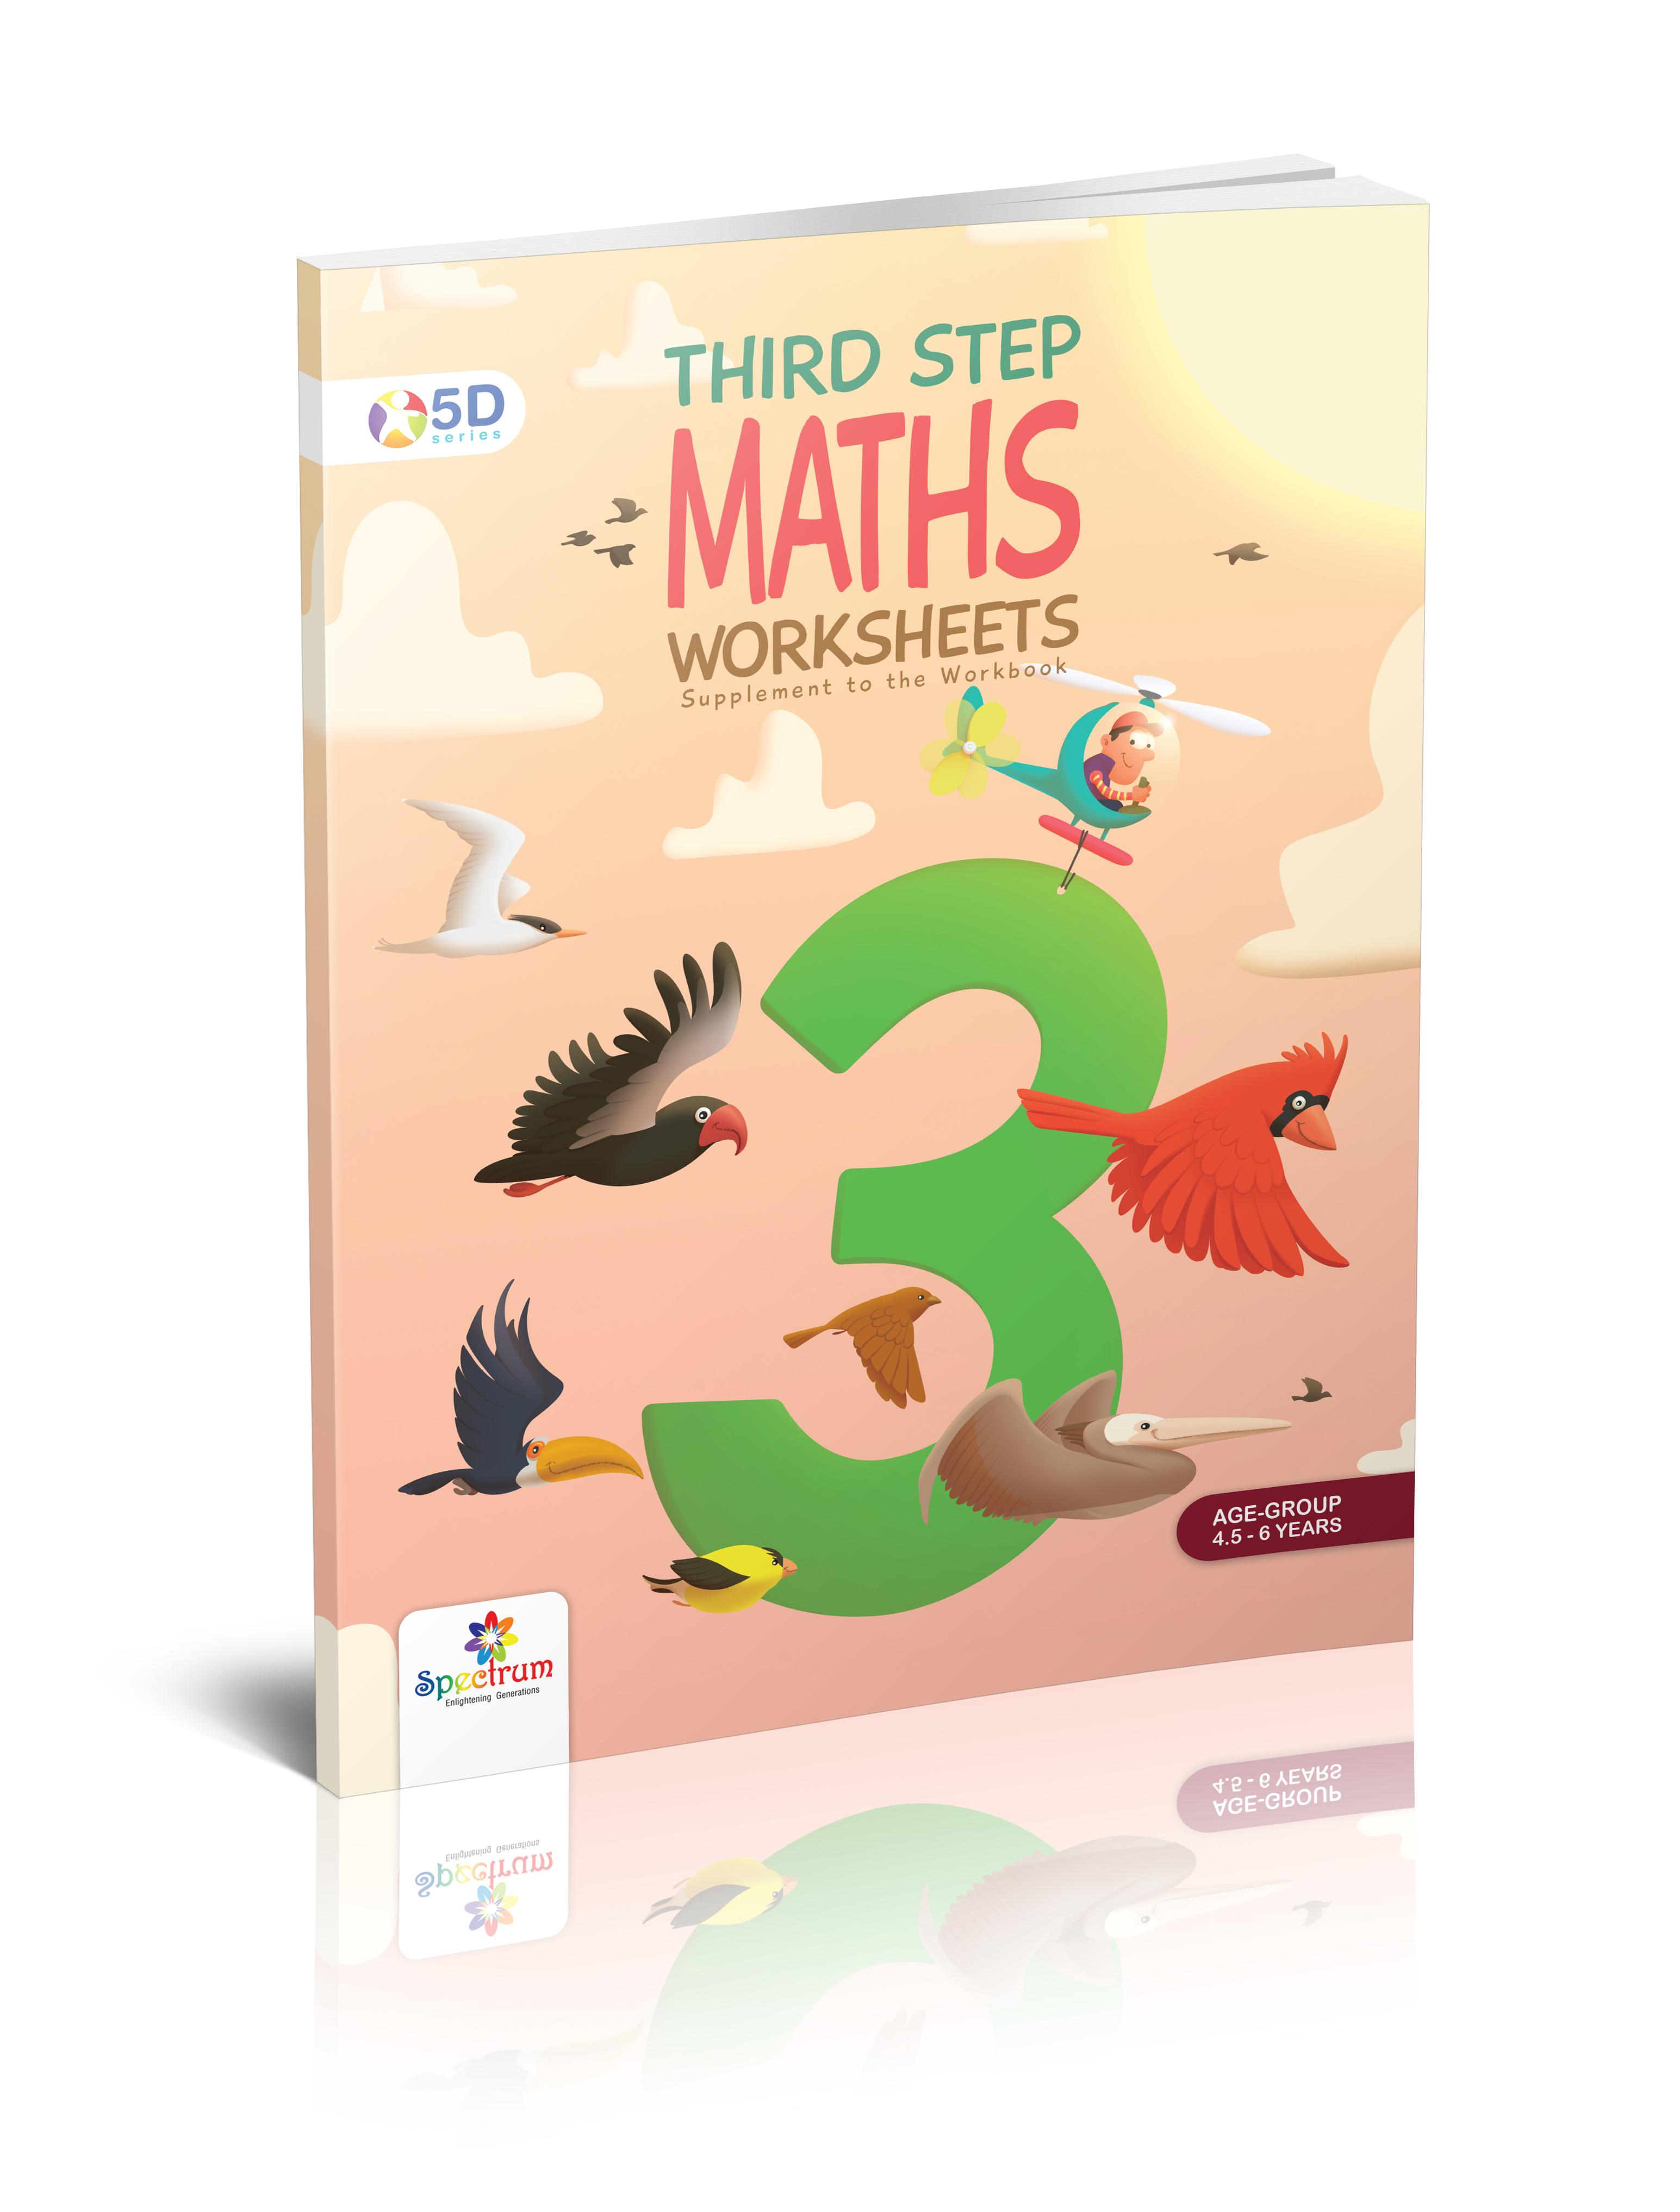 Maths Worksheet Third Step